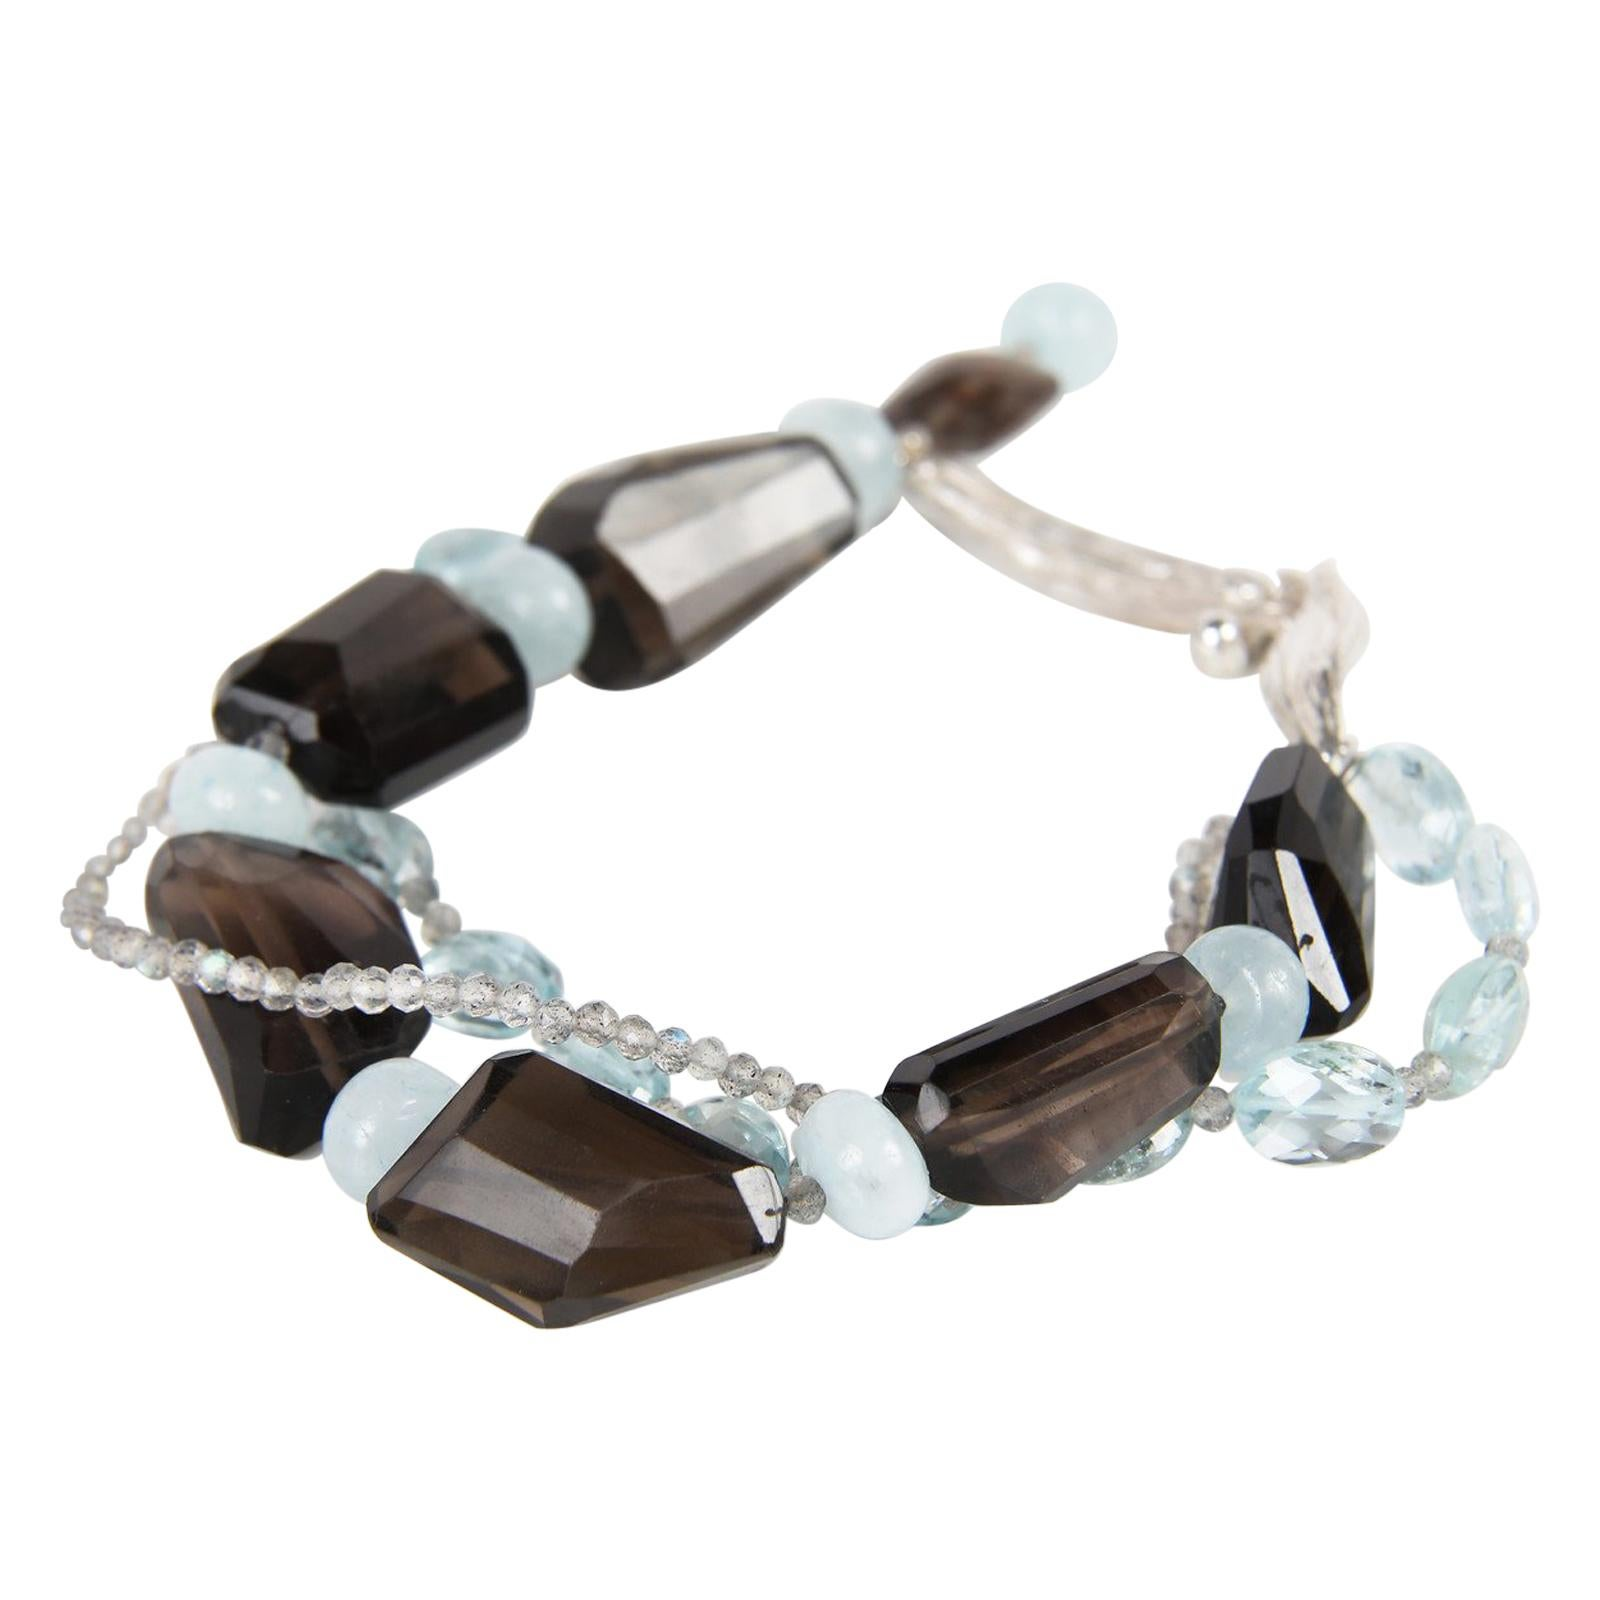 White Orchid Studio Misty Evening 1 Smoky Quartz Aquamarine Silver Bracelet